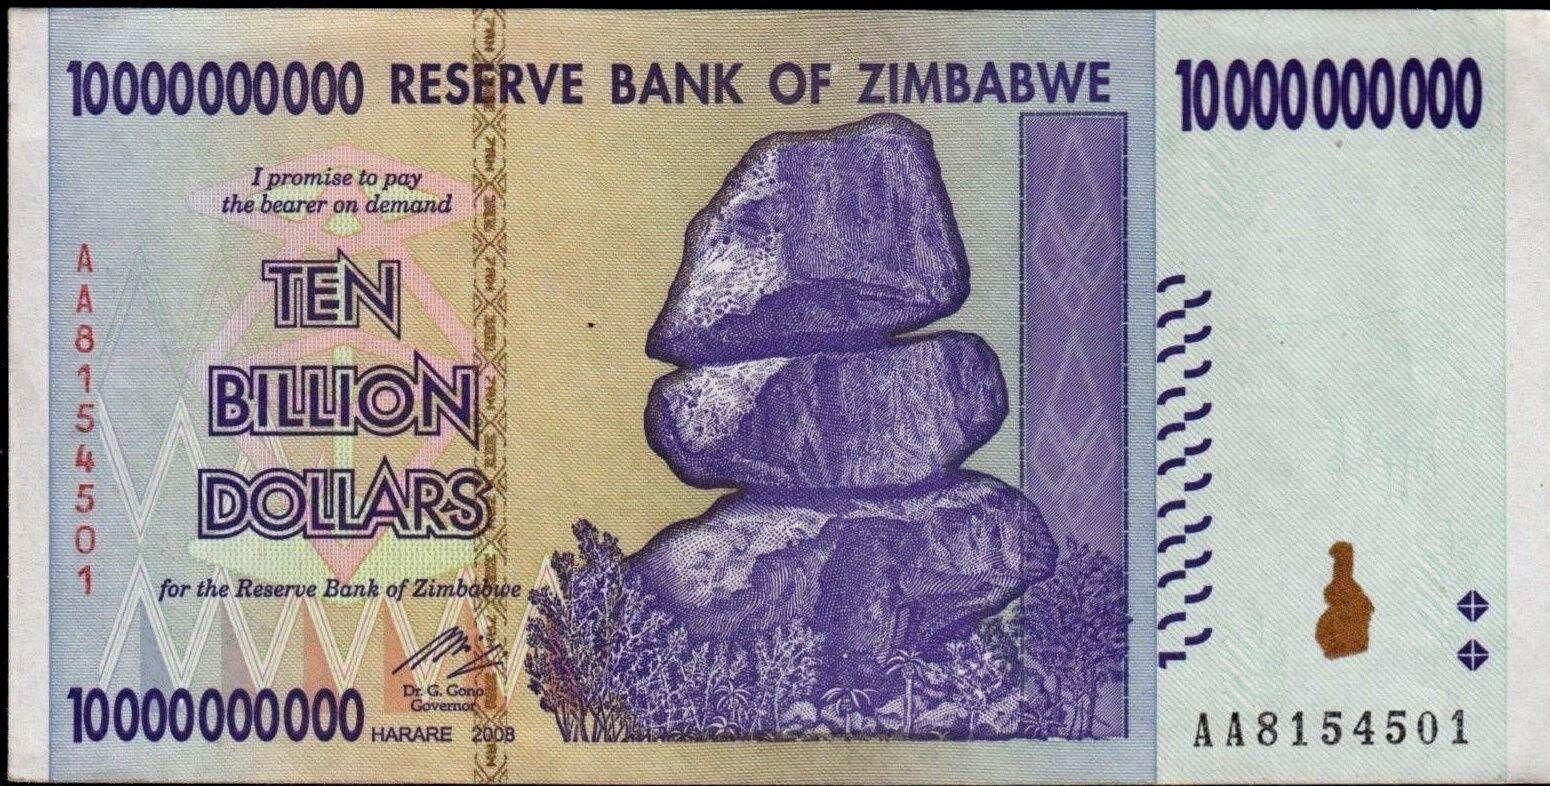 LOT OF TEN ZIMBABWE 20 BILLION DOLLAR BANKNOTES CIRCULATED AA//AB 2008 USED